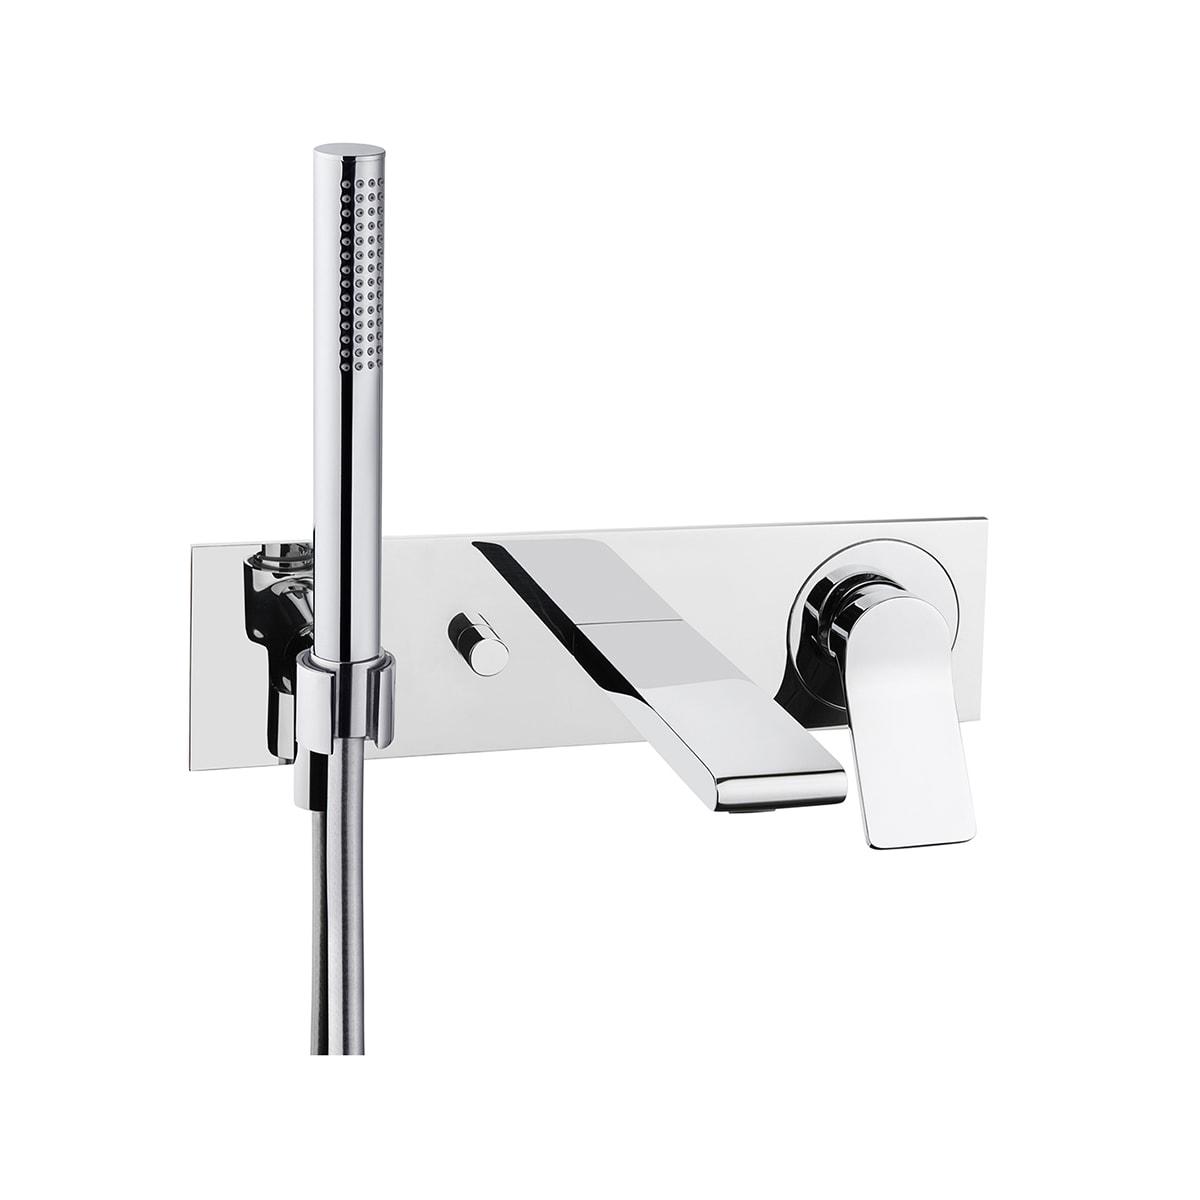 Memoria Built-in Bath/Shower Mixer (Exposed Part)